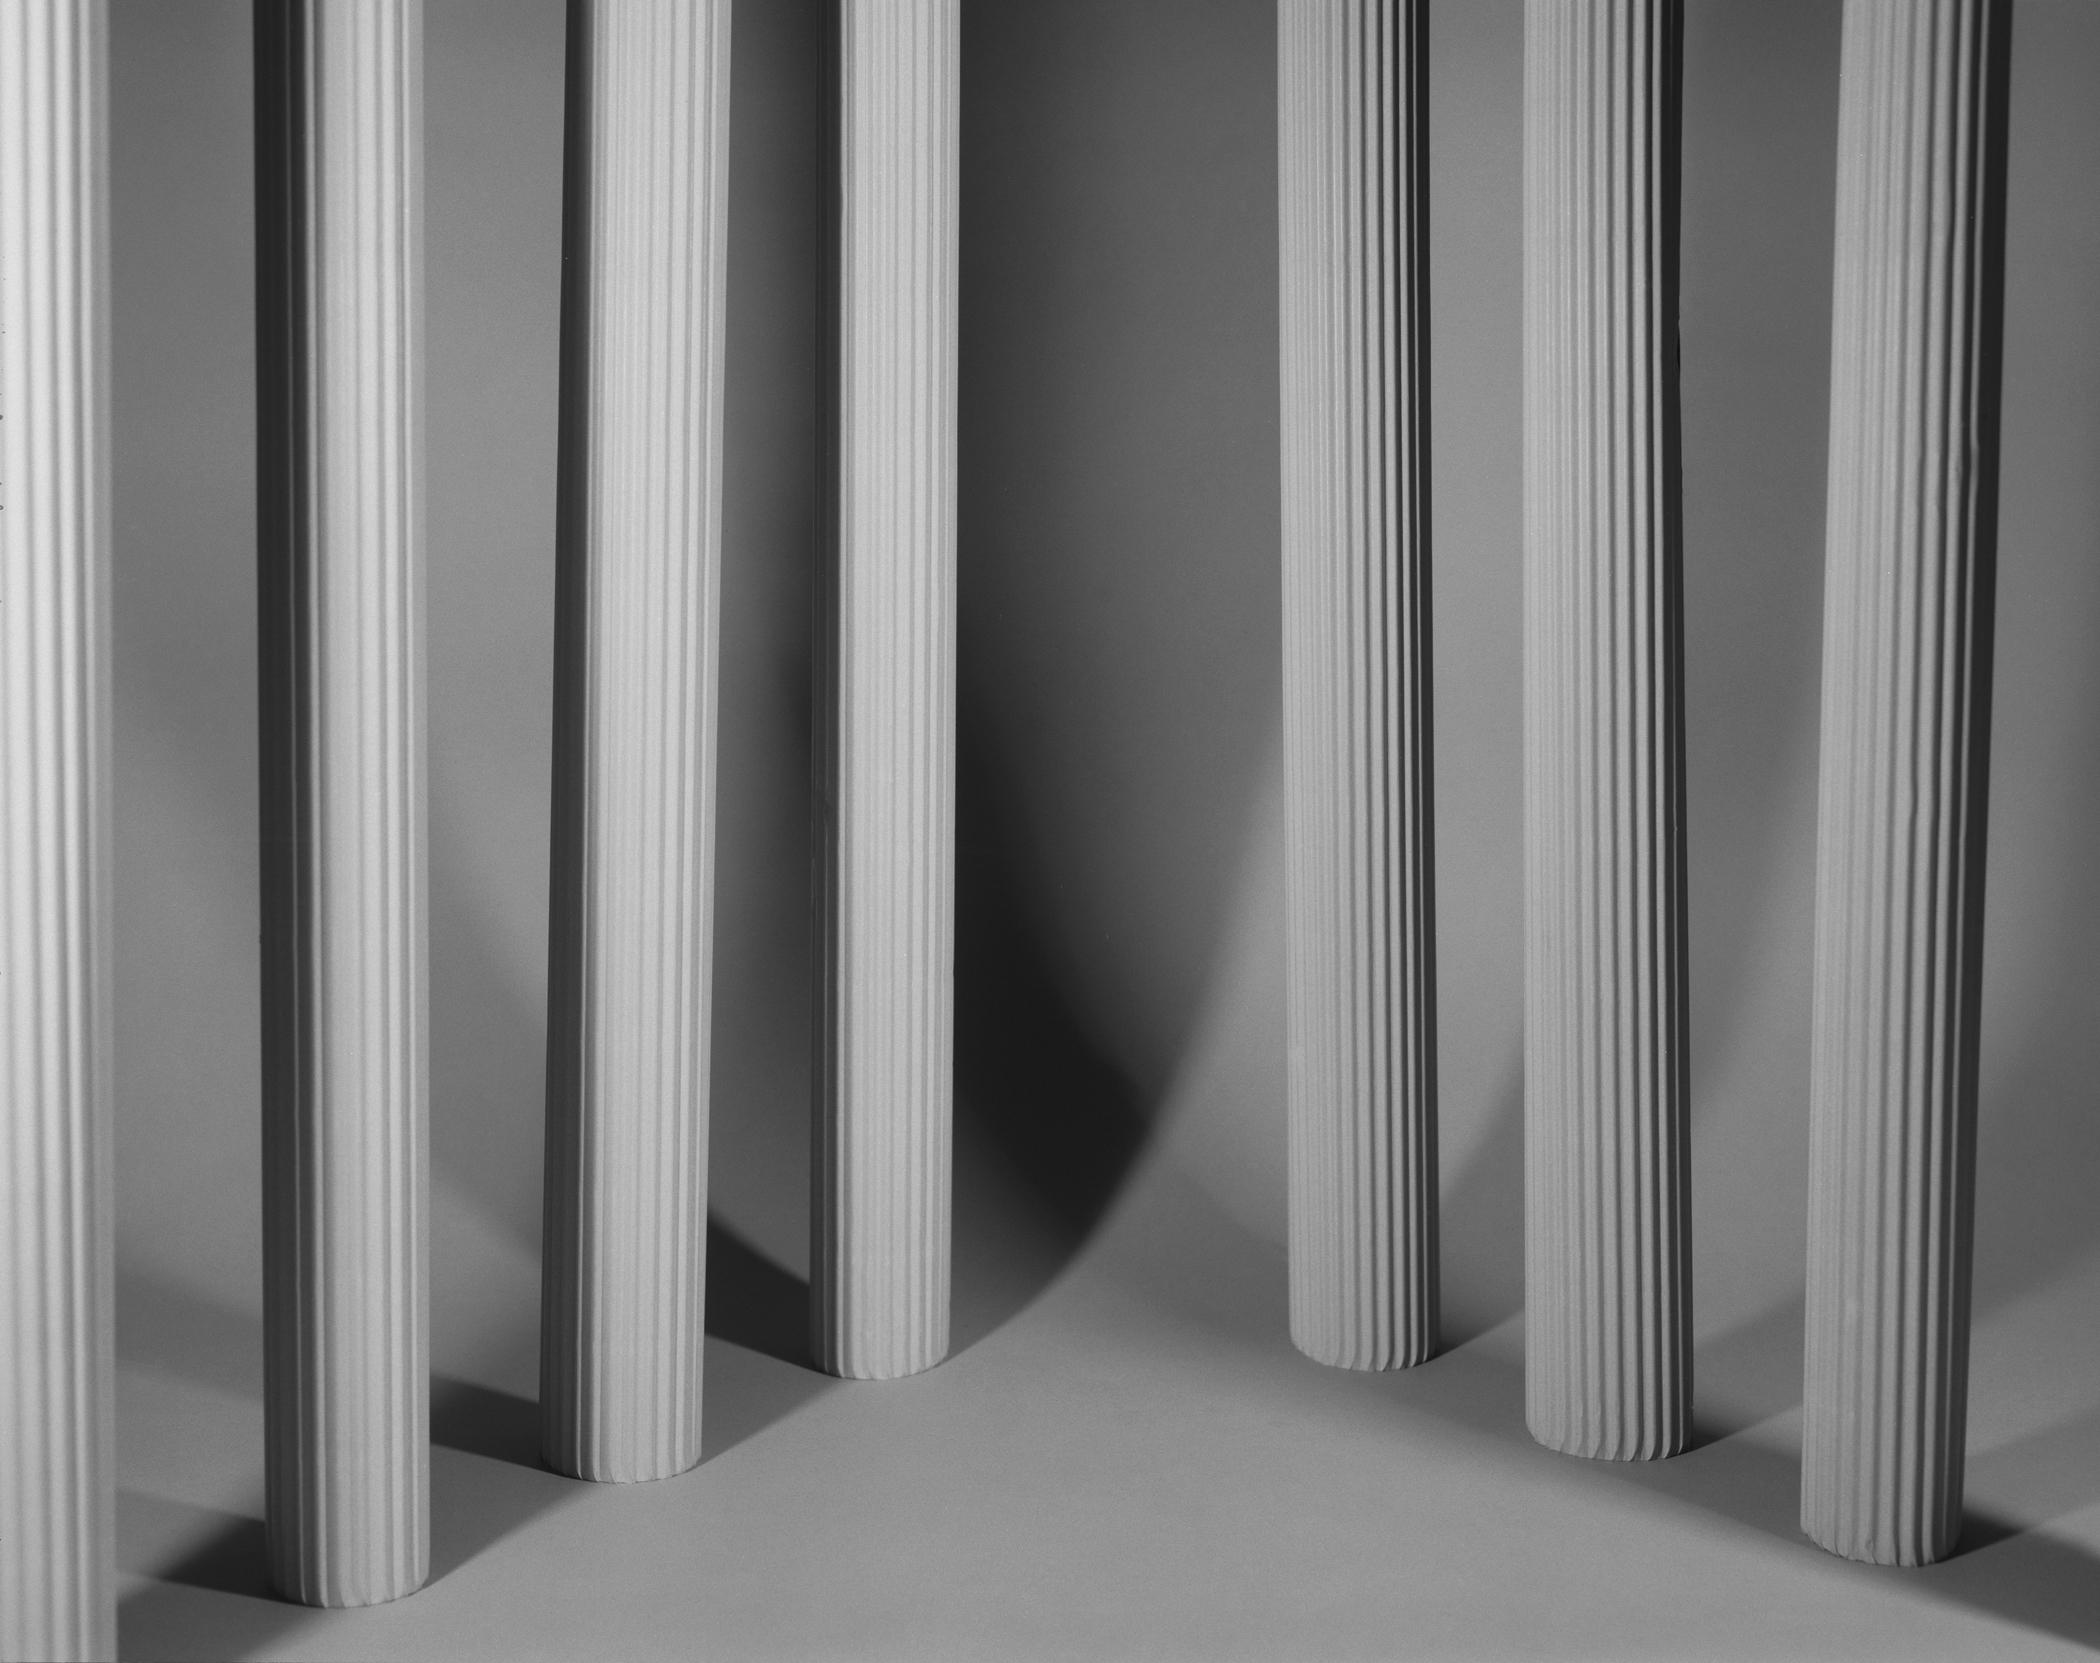 Columns, C-Print, 35 x 45 inches, 2008